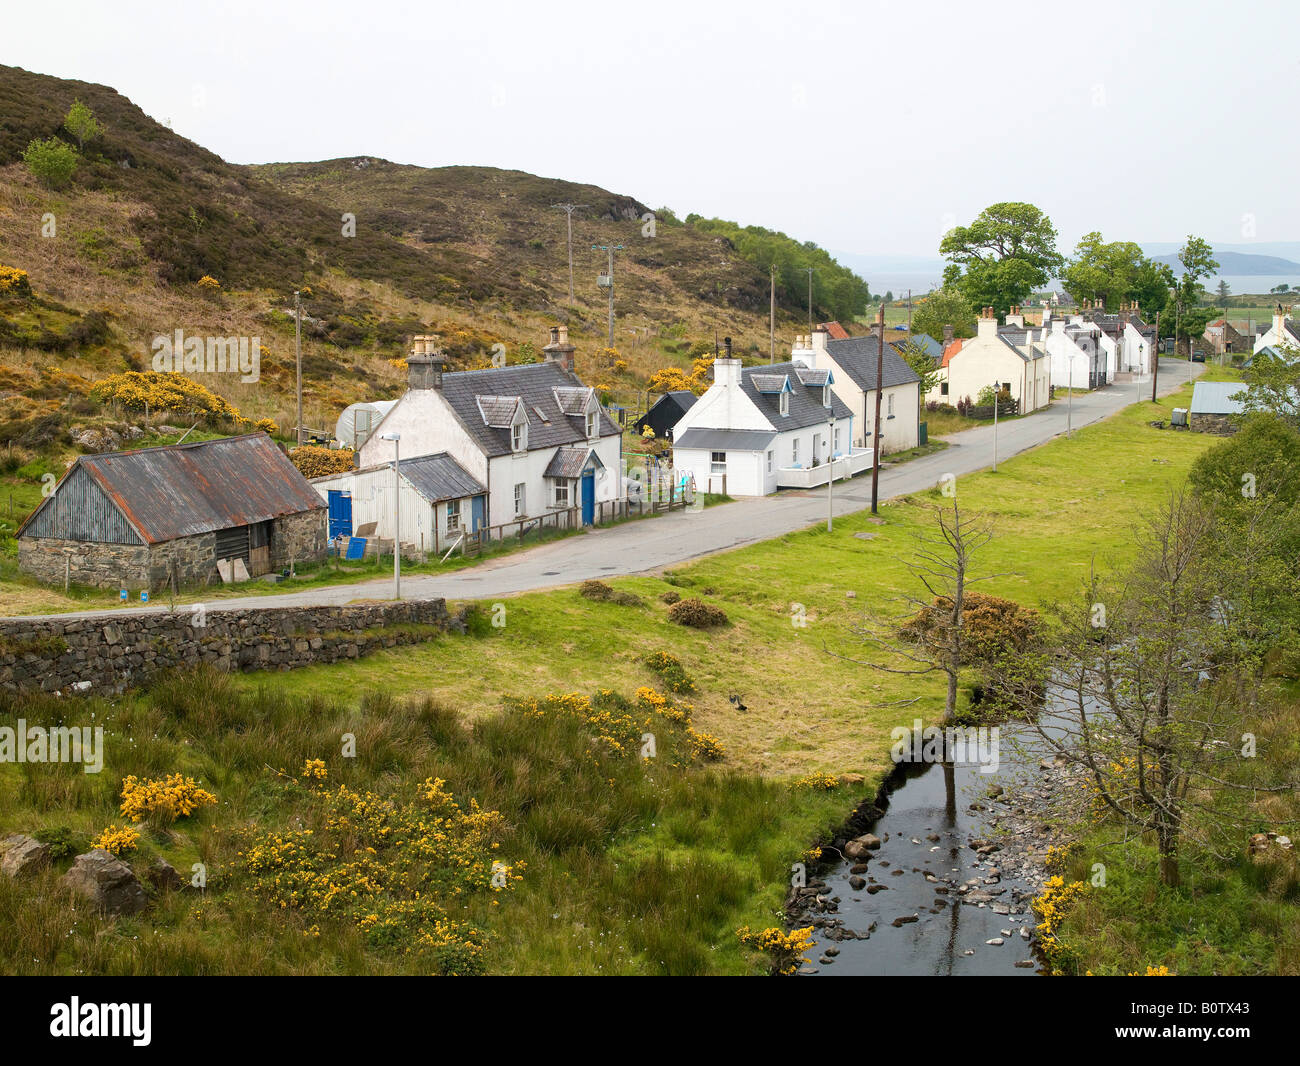 Croft Houses, Duirinish, Nr Kyle of Lochalsh, Ross-Shire, Highland Scotland - Stock Image